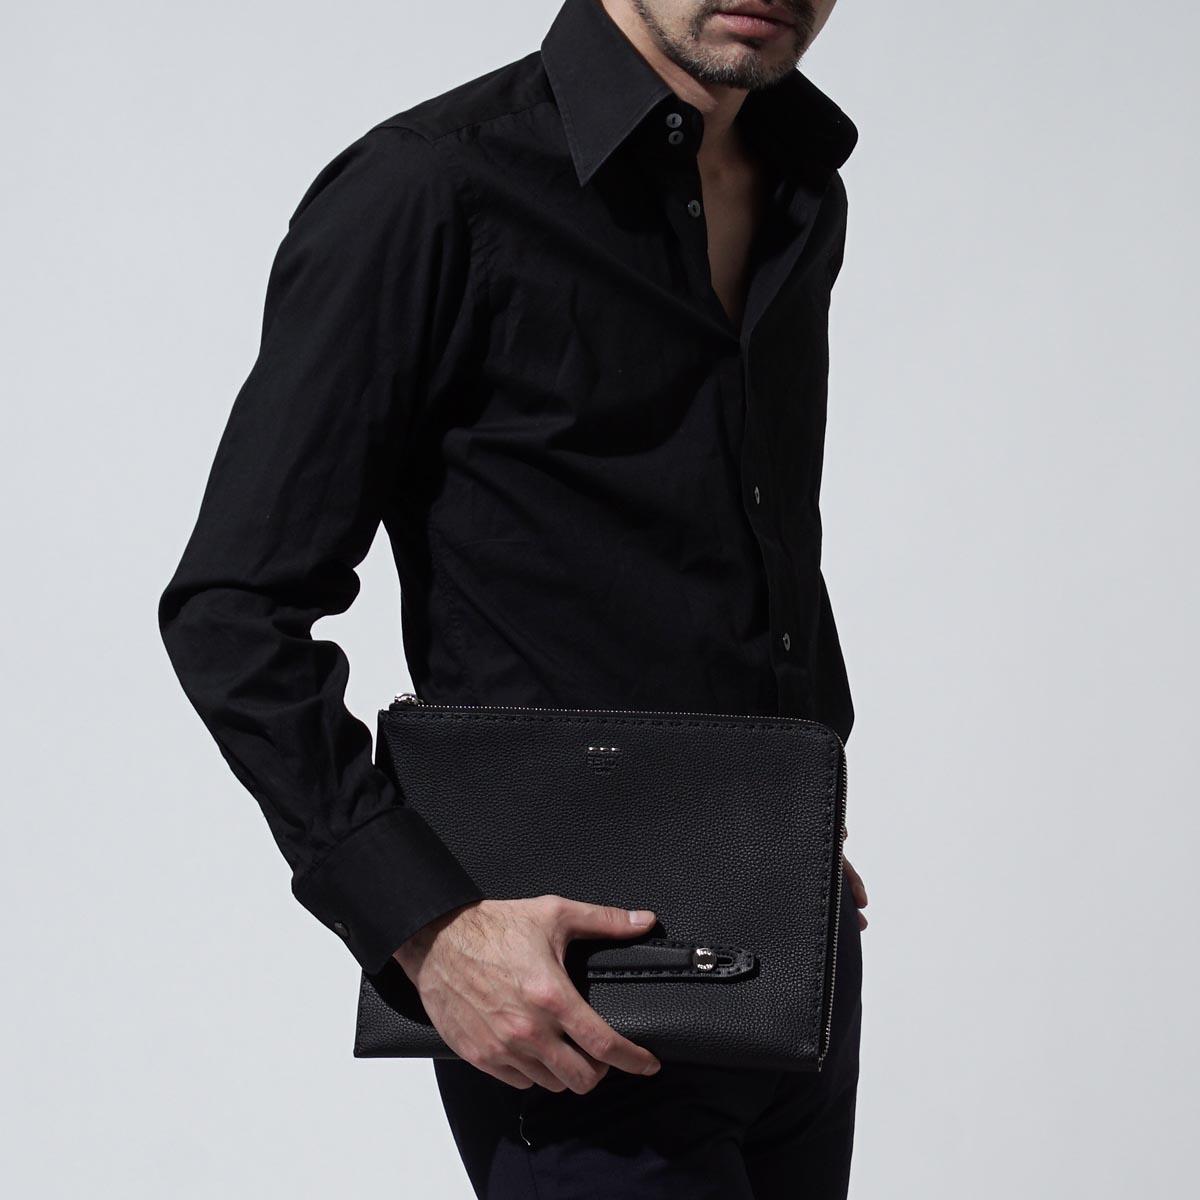 Fendi Clutch Bag For Men